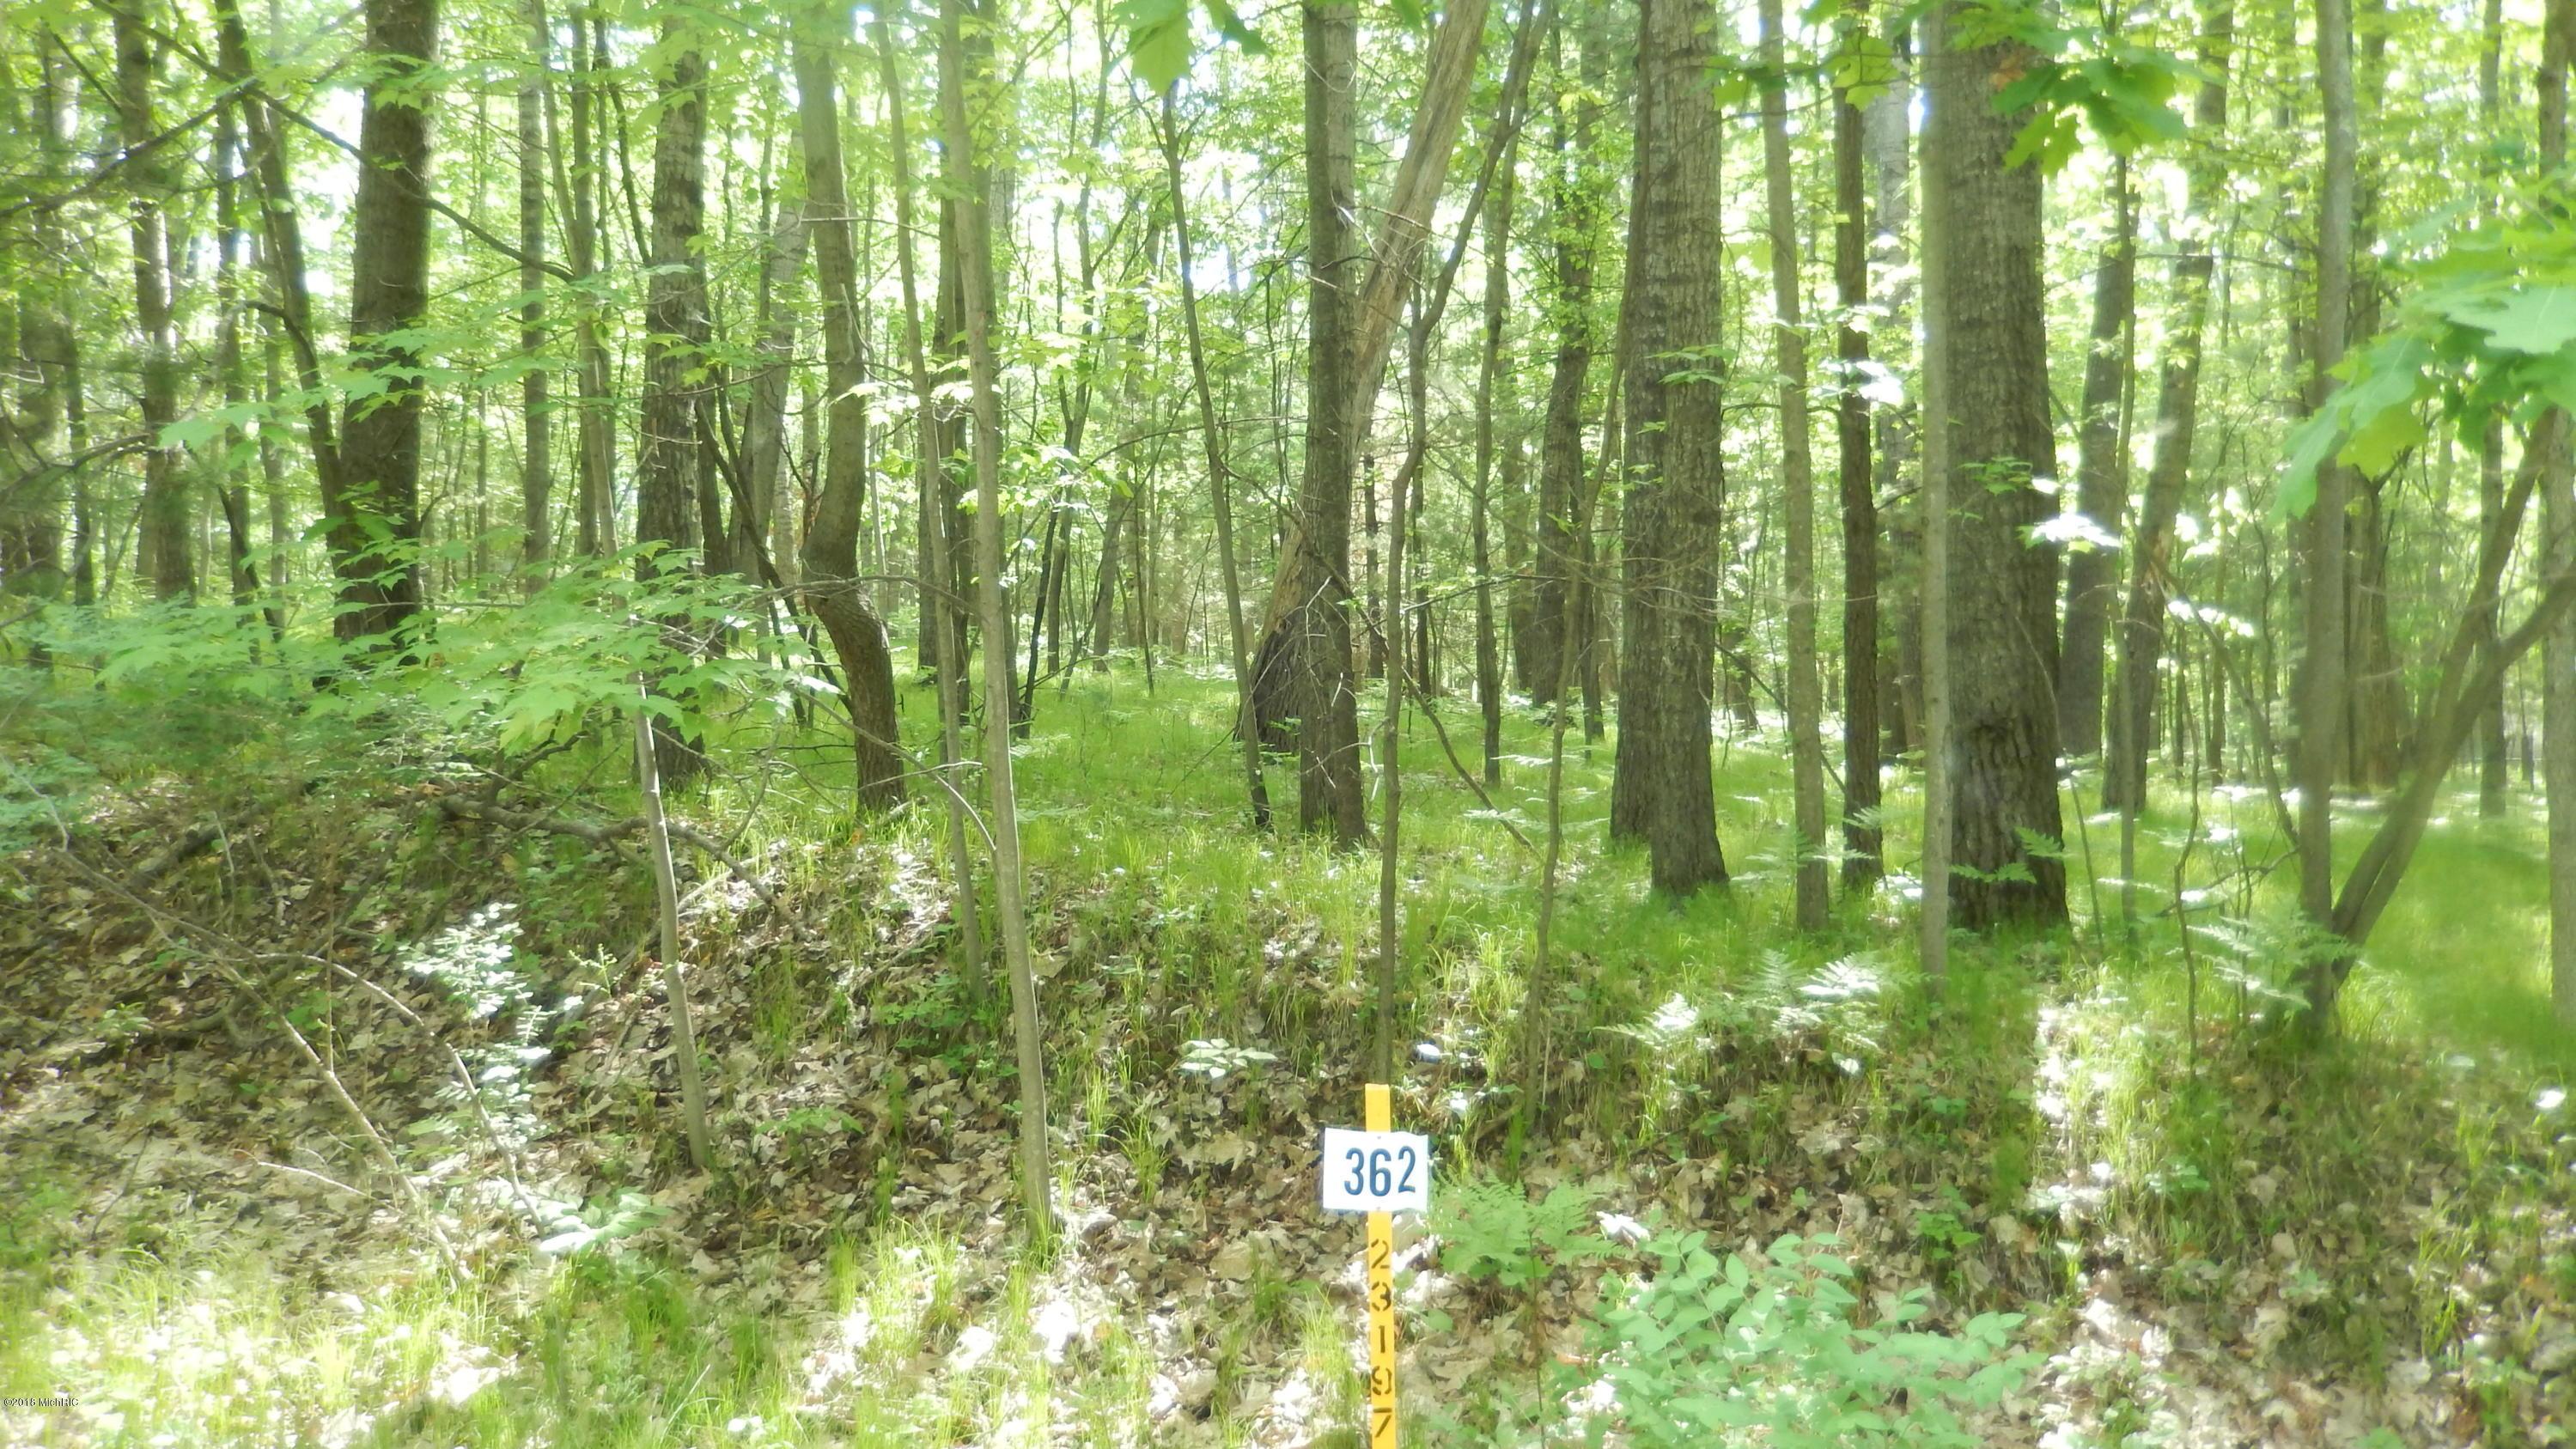 8278 Highland Trail, 362, Canadian Lakes, MI 49346